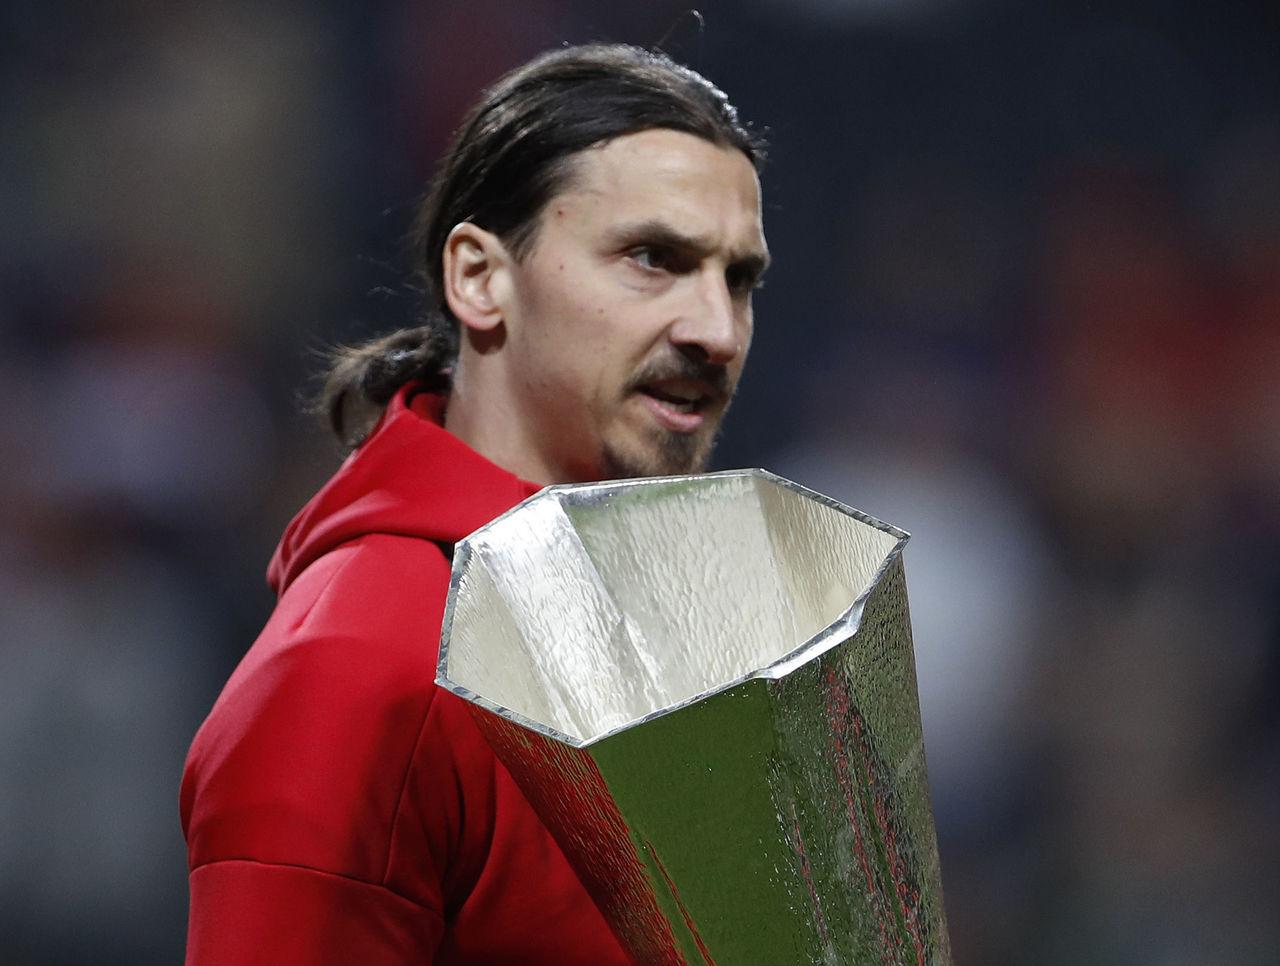 Cropped 2017 05 24t211710z 138662230 mt1aci14797941 rtrmadp 3 soccer europa final